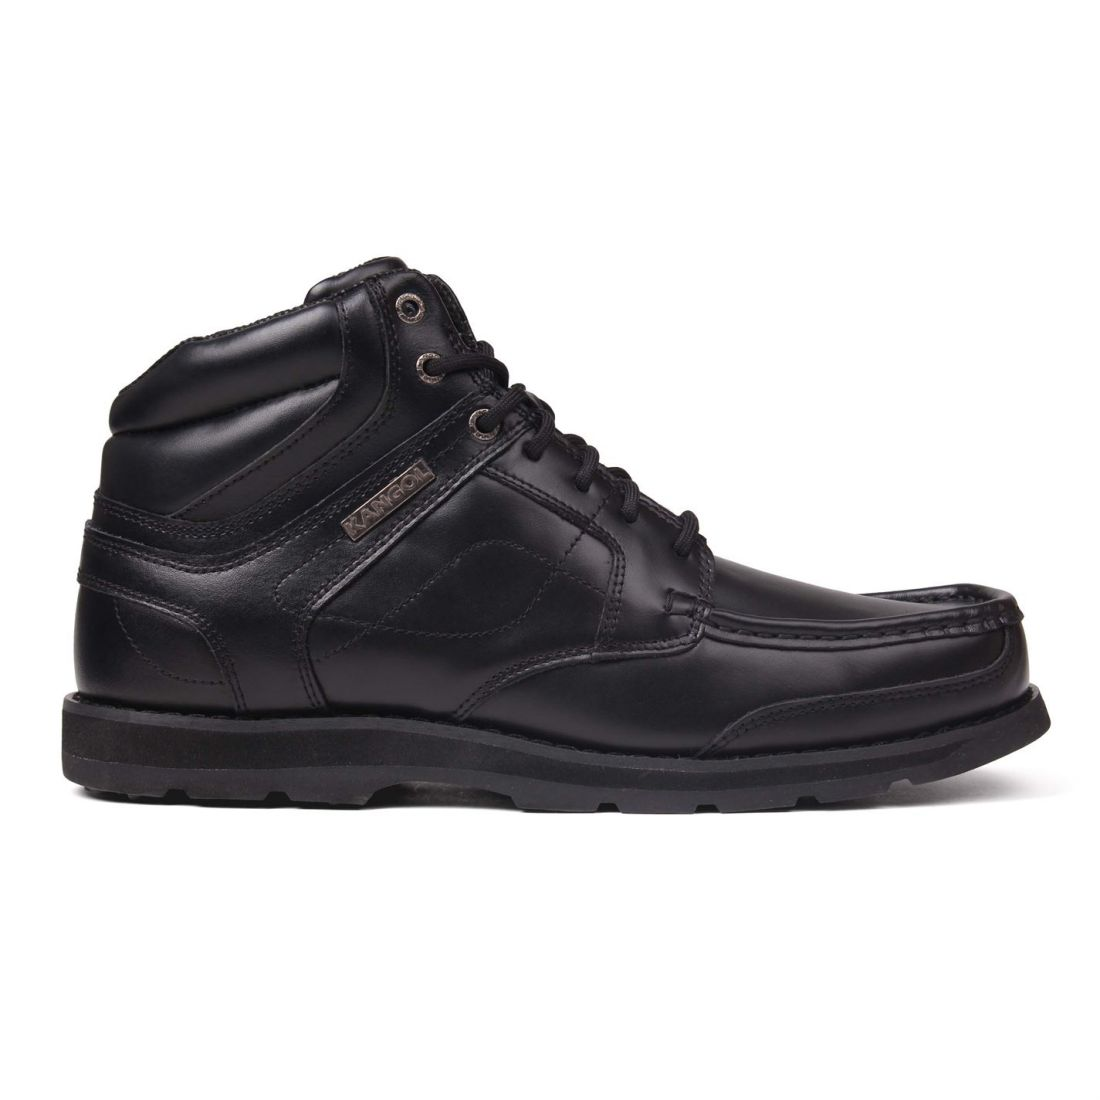 fccfaea9 Kangol-Harrow-Boots-Lace-Up-Gents-Mens thumbnail 3